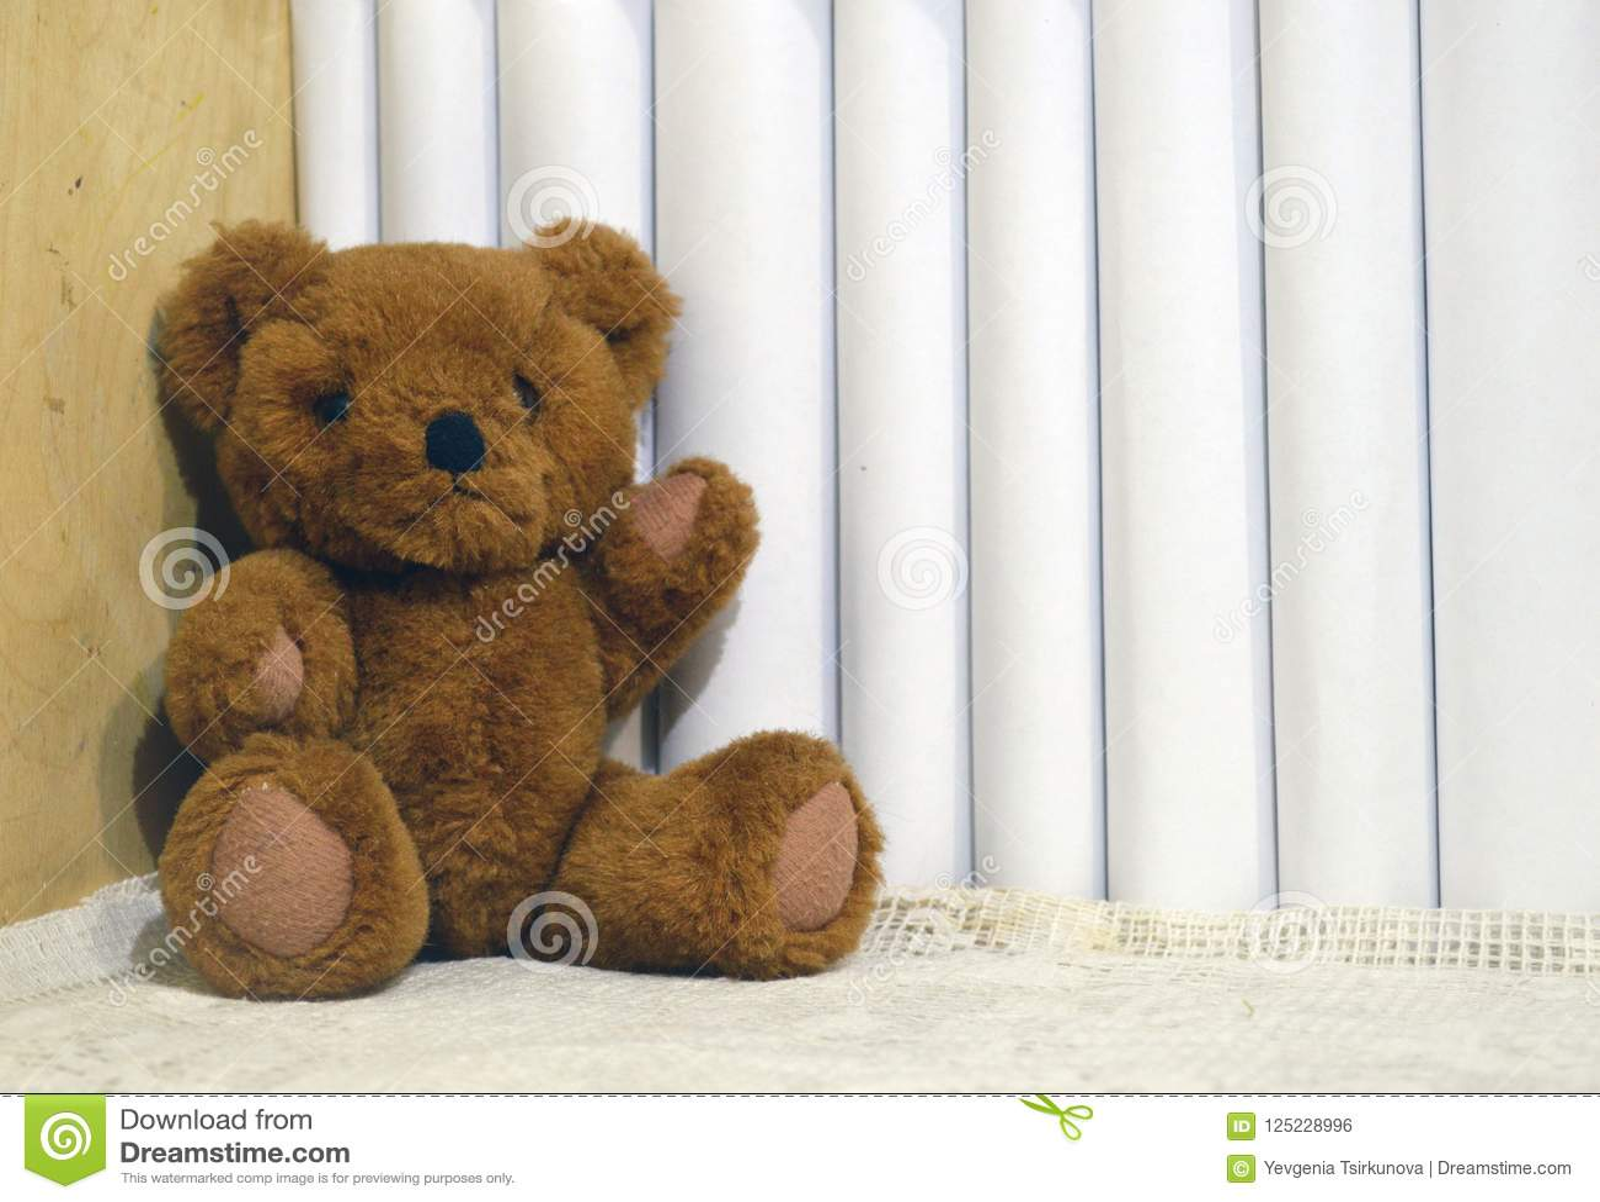 Teddybär betreffen das Bücherregal